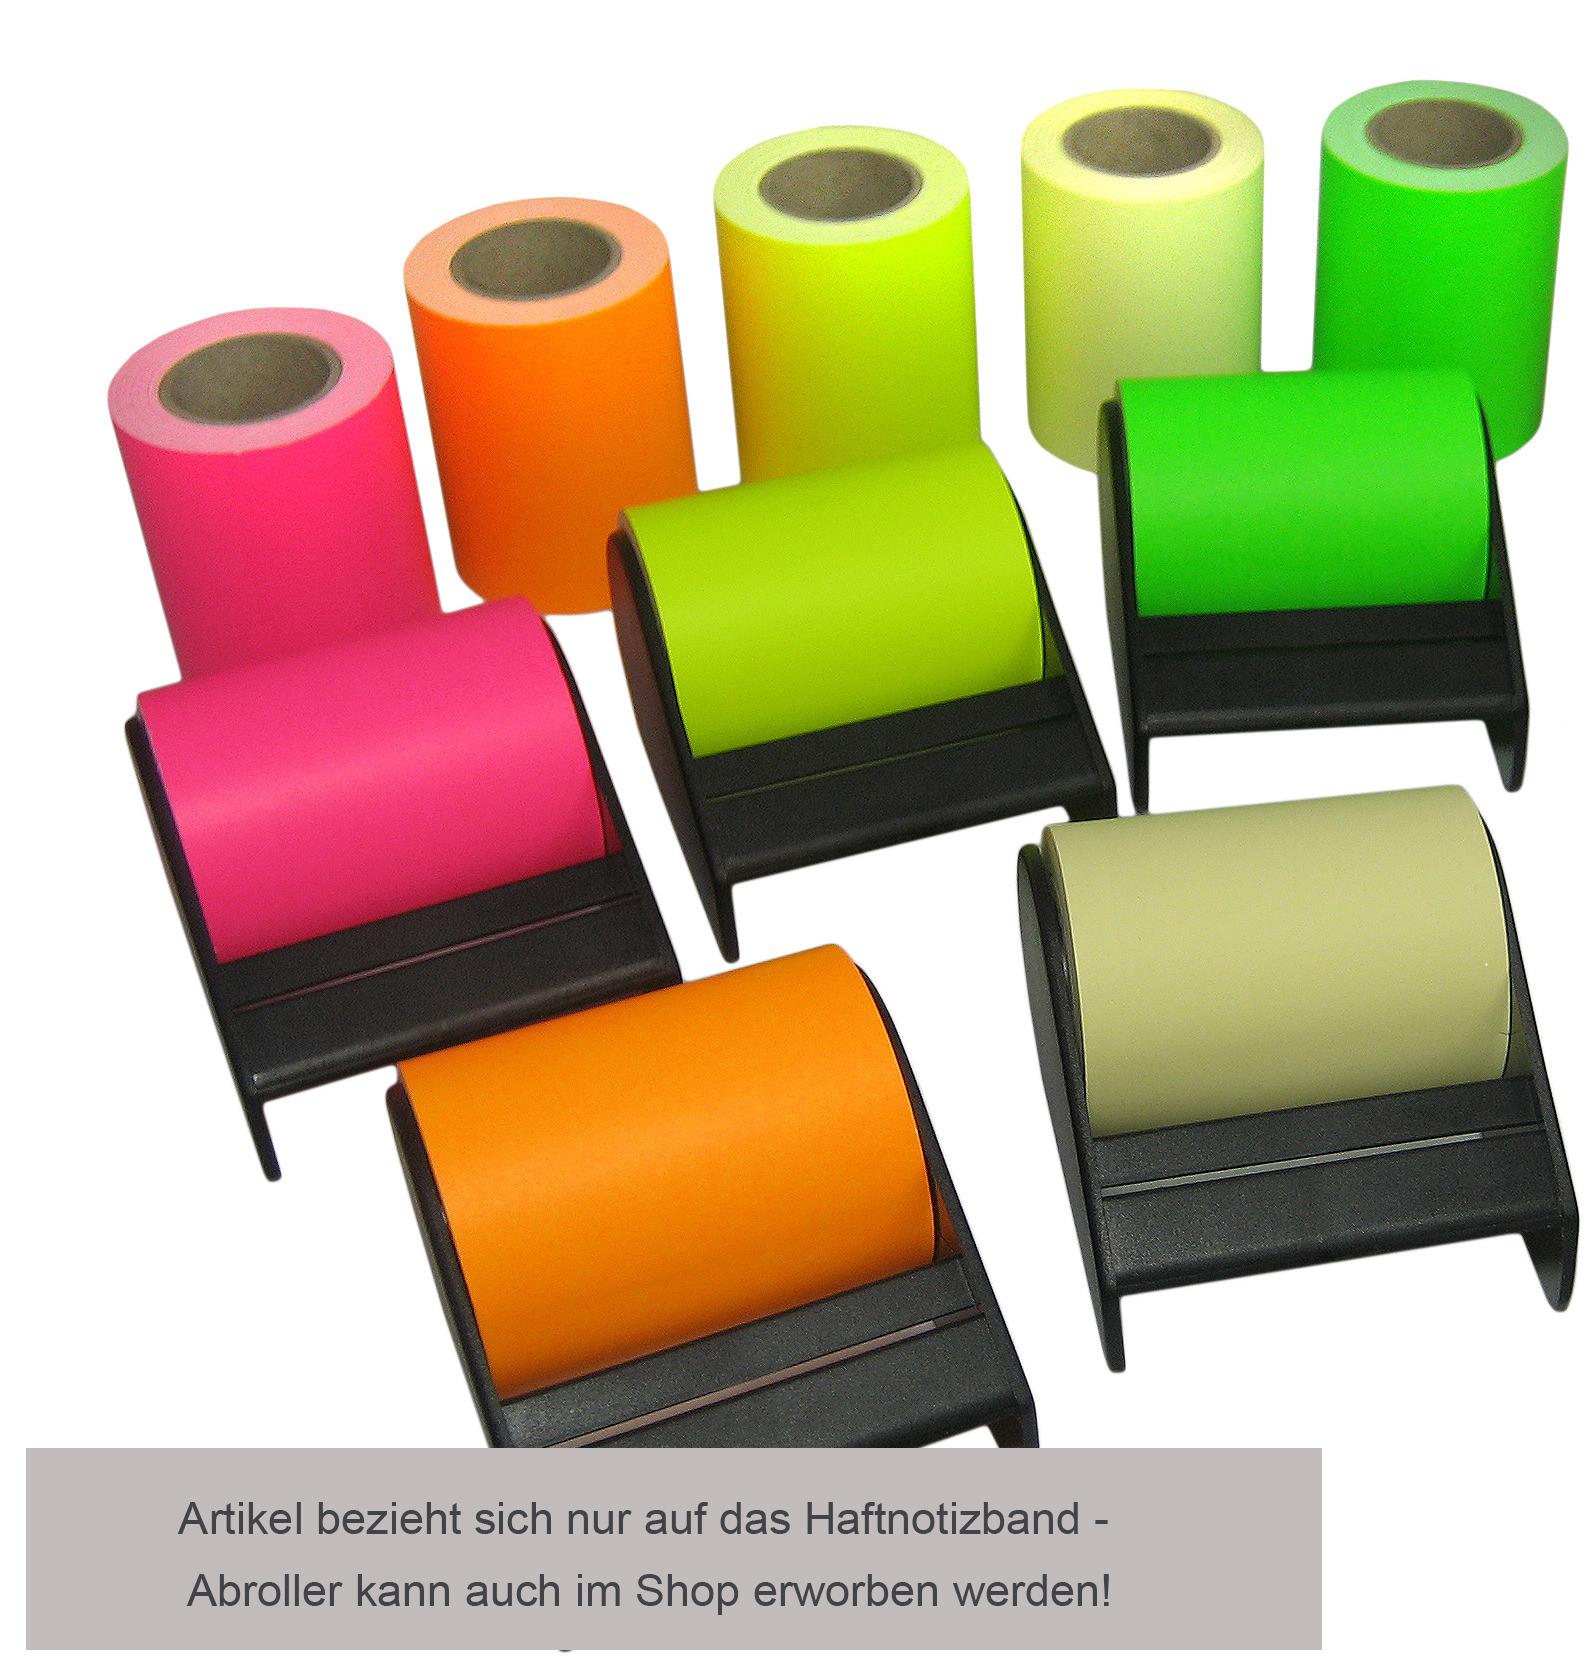 roll 39 n 39 write neon haftnotizband klebeband 10m 60mm postit neuheiten fixon. Black Bedroom Furniture Sets. Home Design Ideas